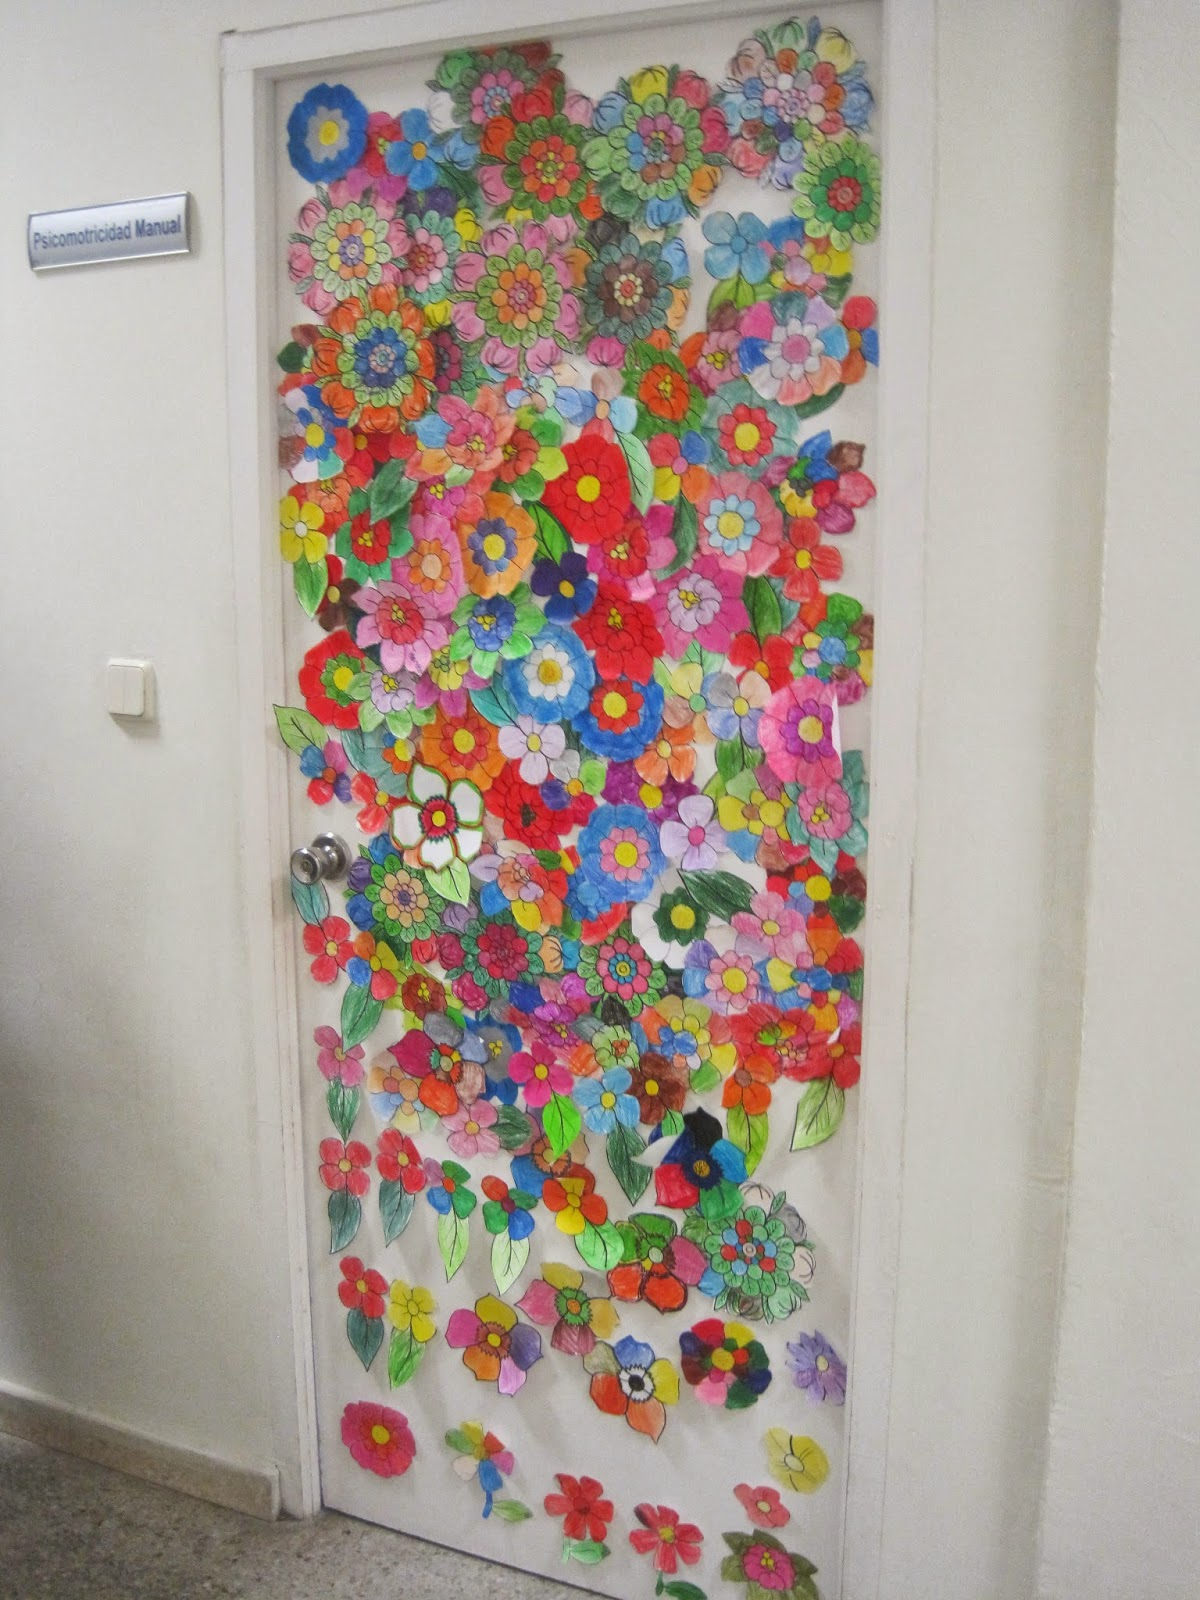 Imagenes de puertas decoradas preescolar puertas primavera for Puertas decoradas educacion infantil